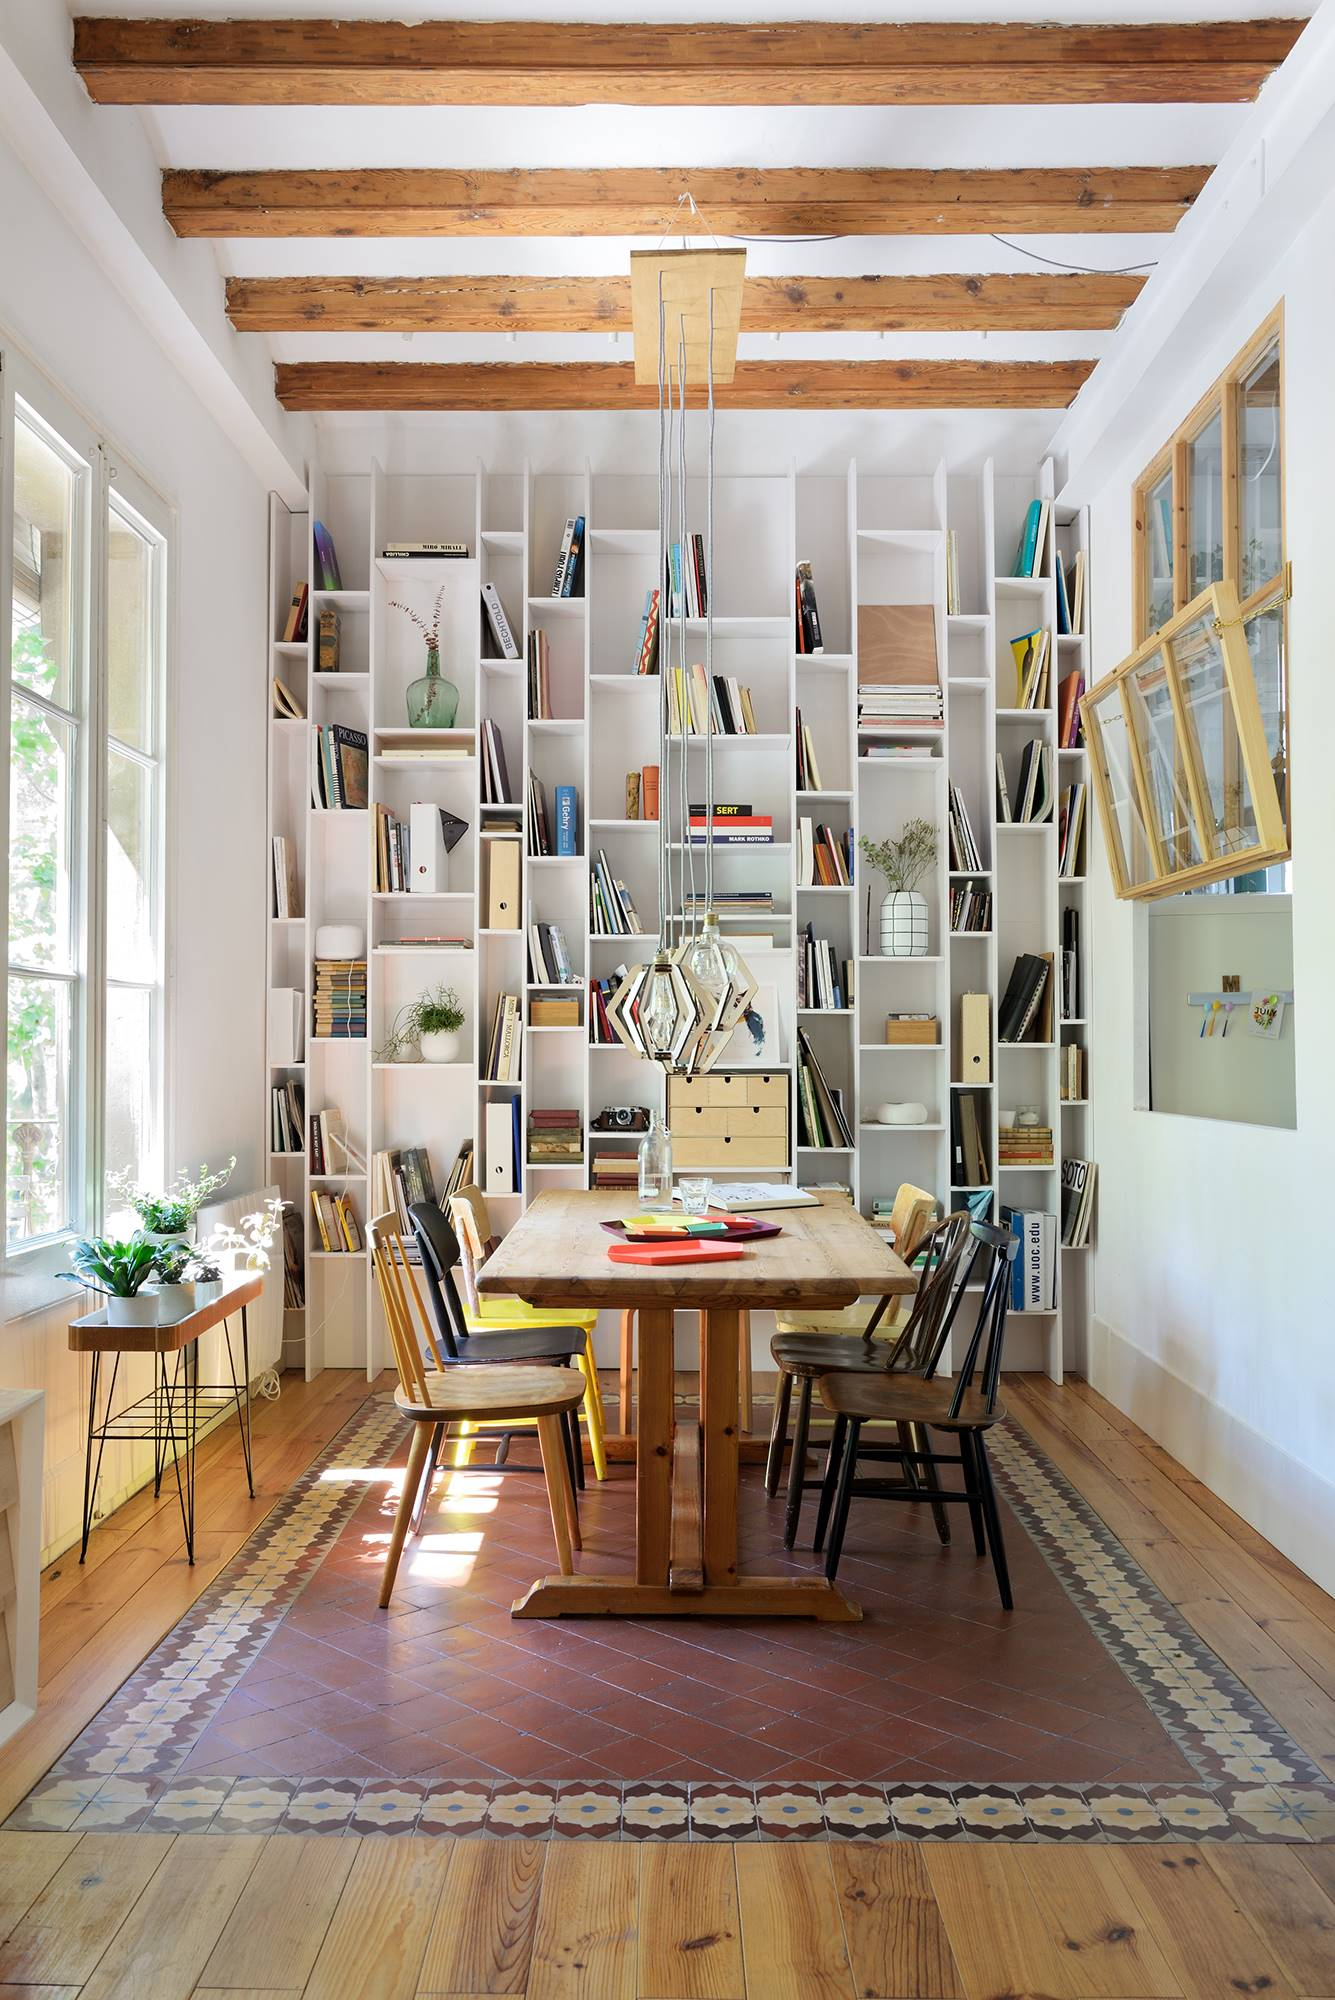 Fotos Muebles Para Librerias Mobiliario Papelerias Salon Ninos ...